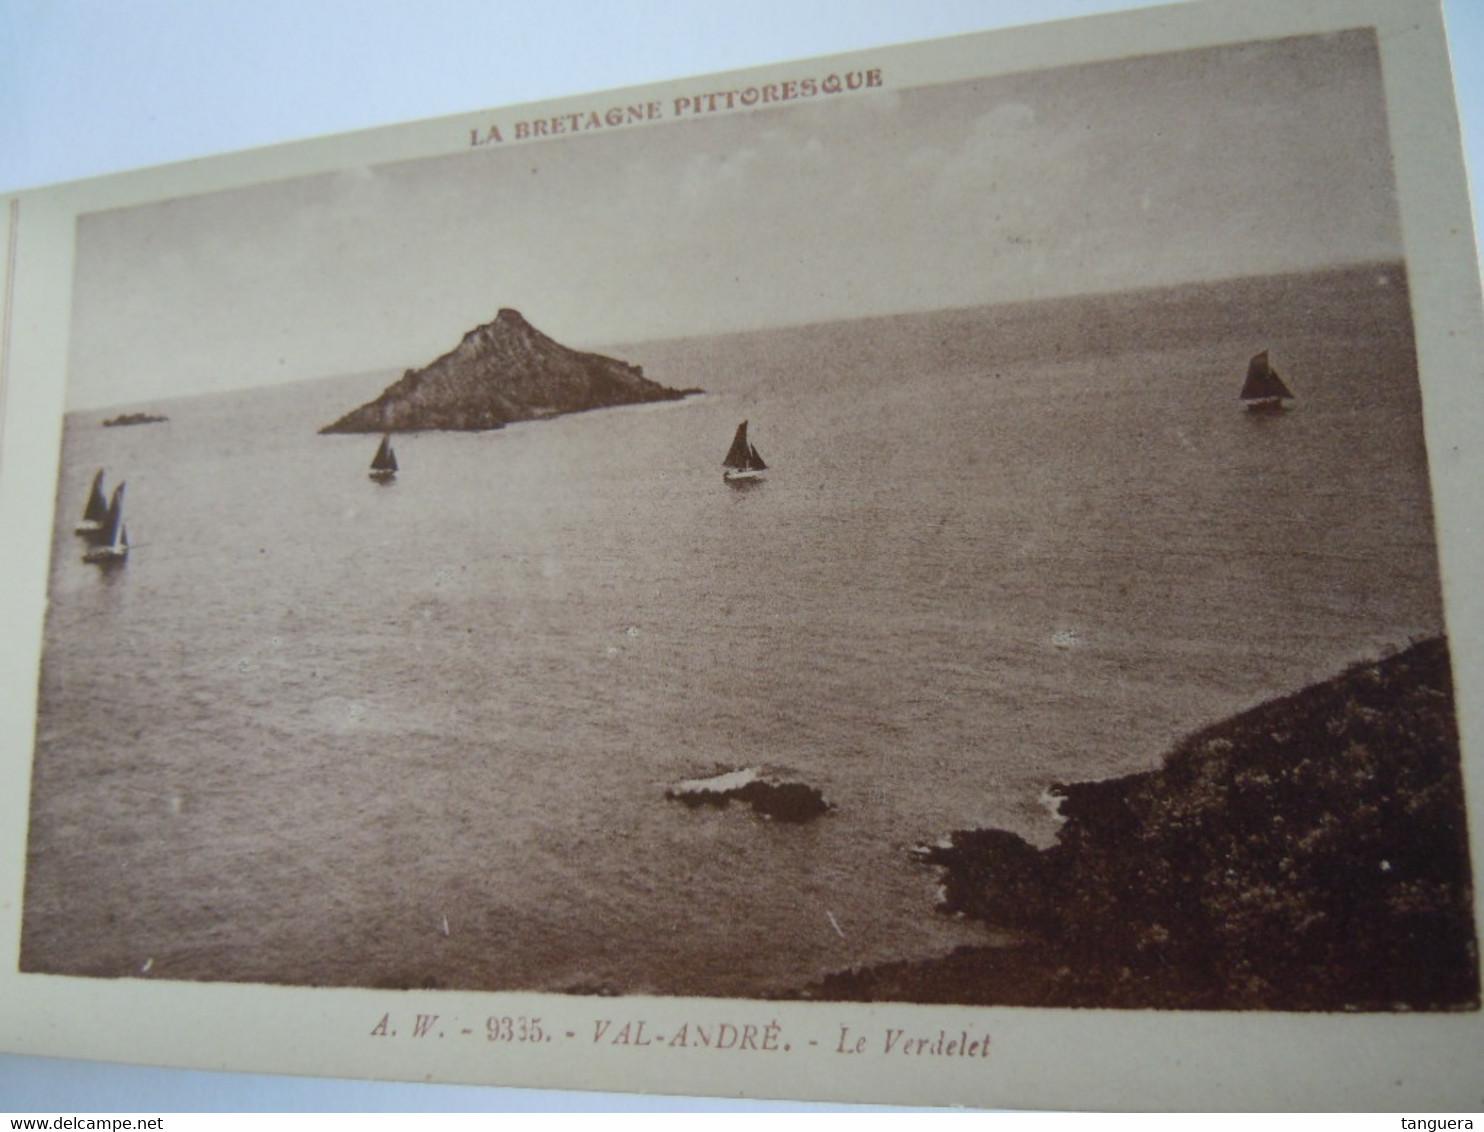 La Bretagne Pittoresque Val-André Carnet 12 Cartes Vues Edition A. Waron - Bretagne